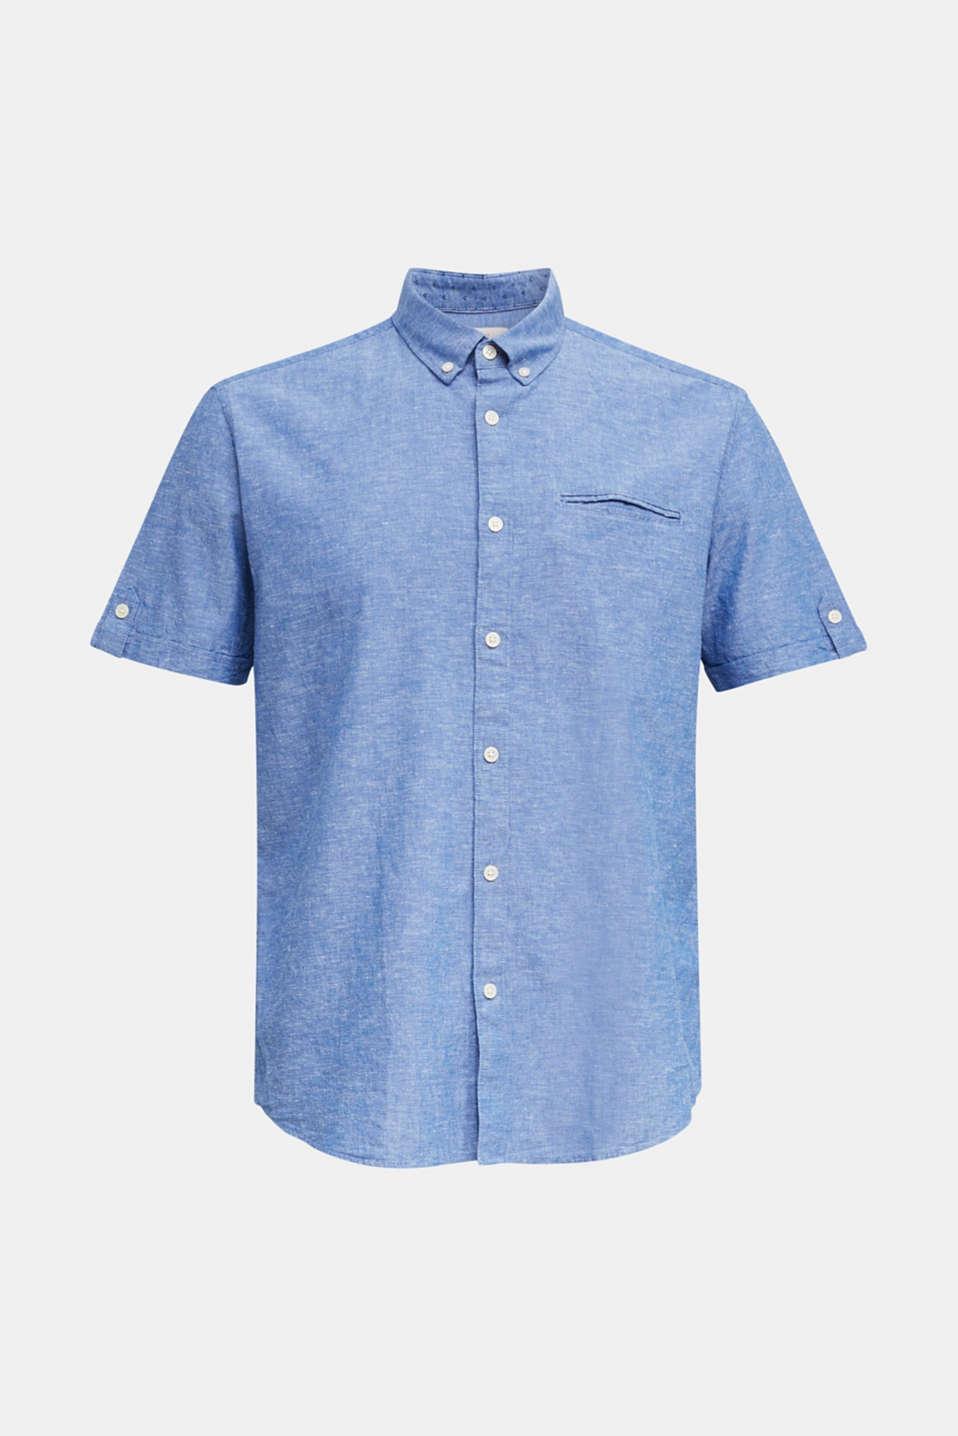 With linen: short-sleeved shirt, LIGHT BLUE 5, detail image number 6